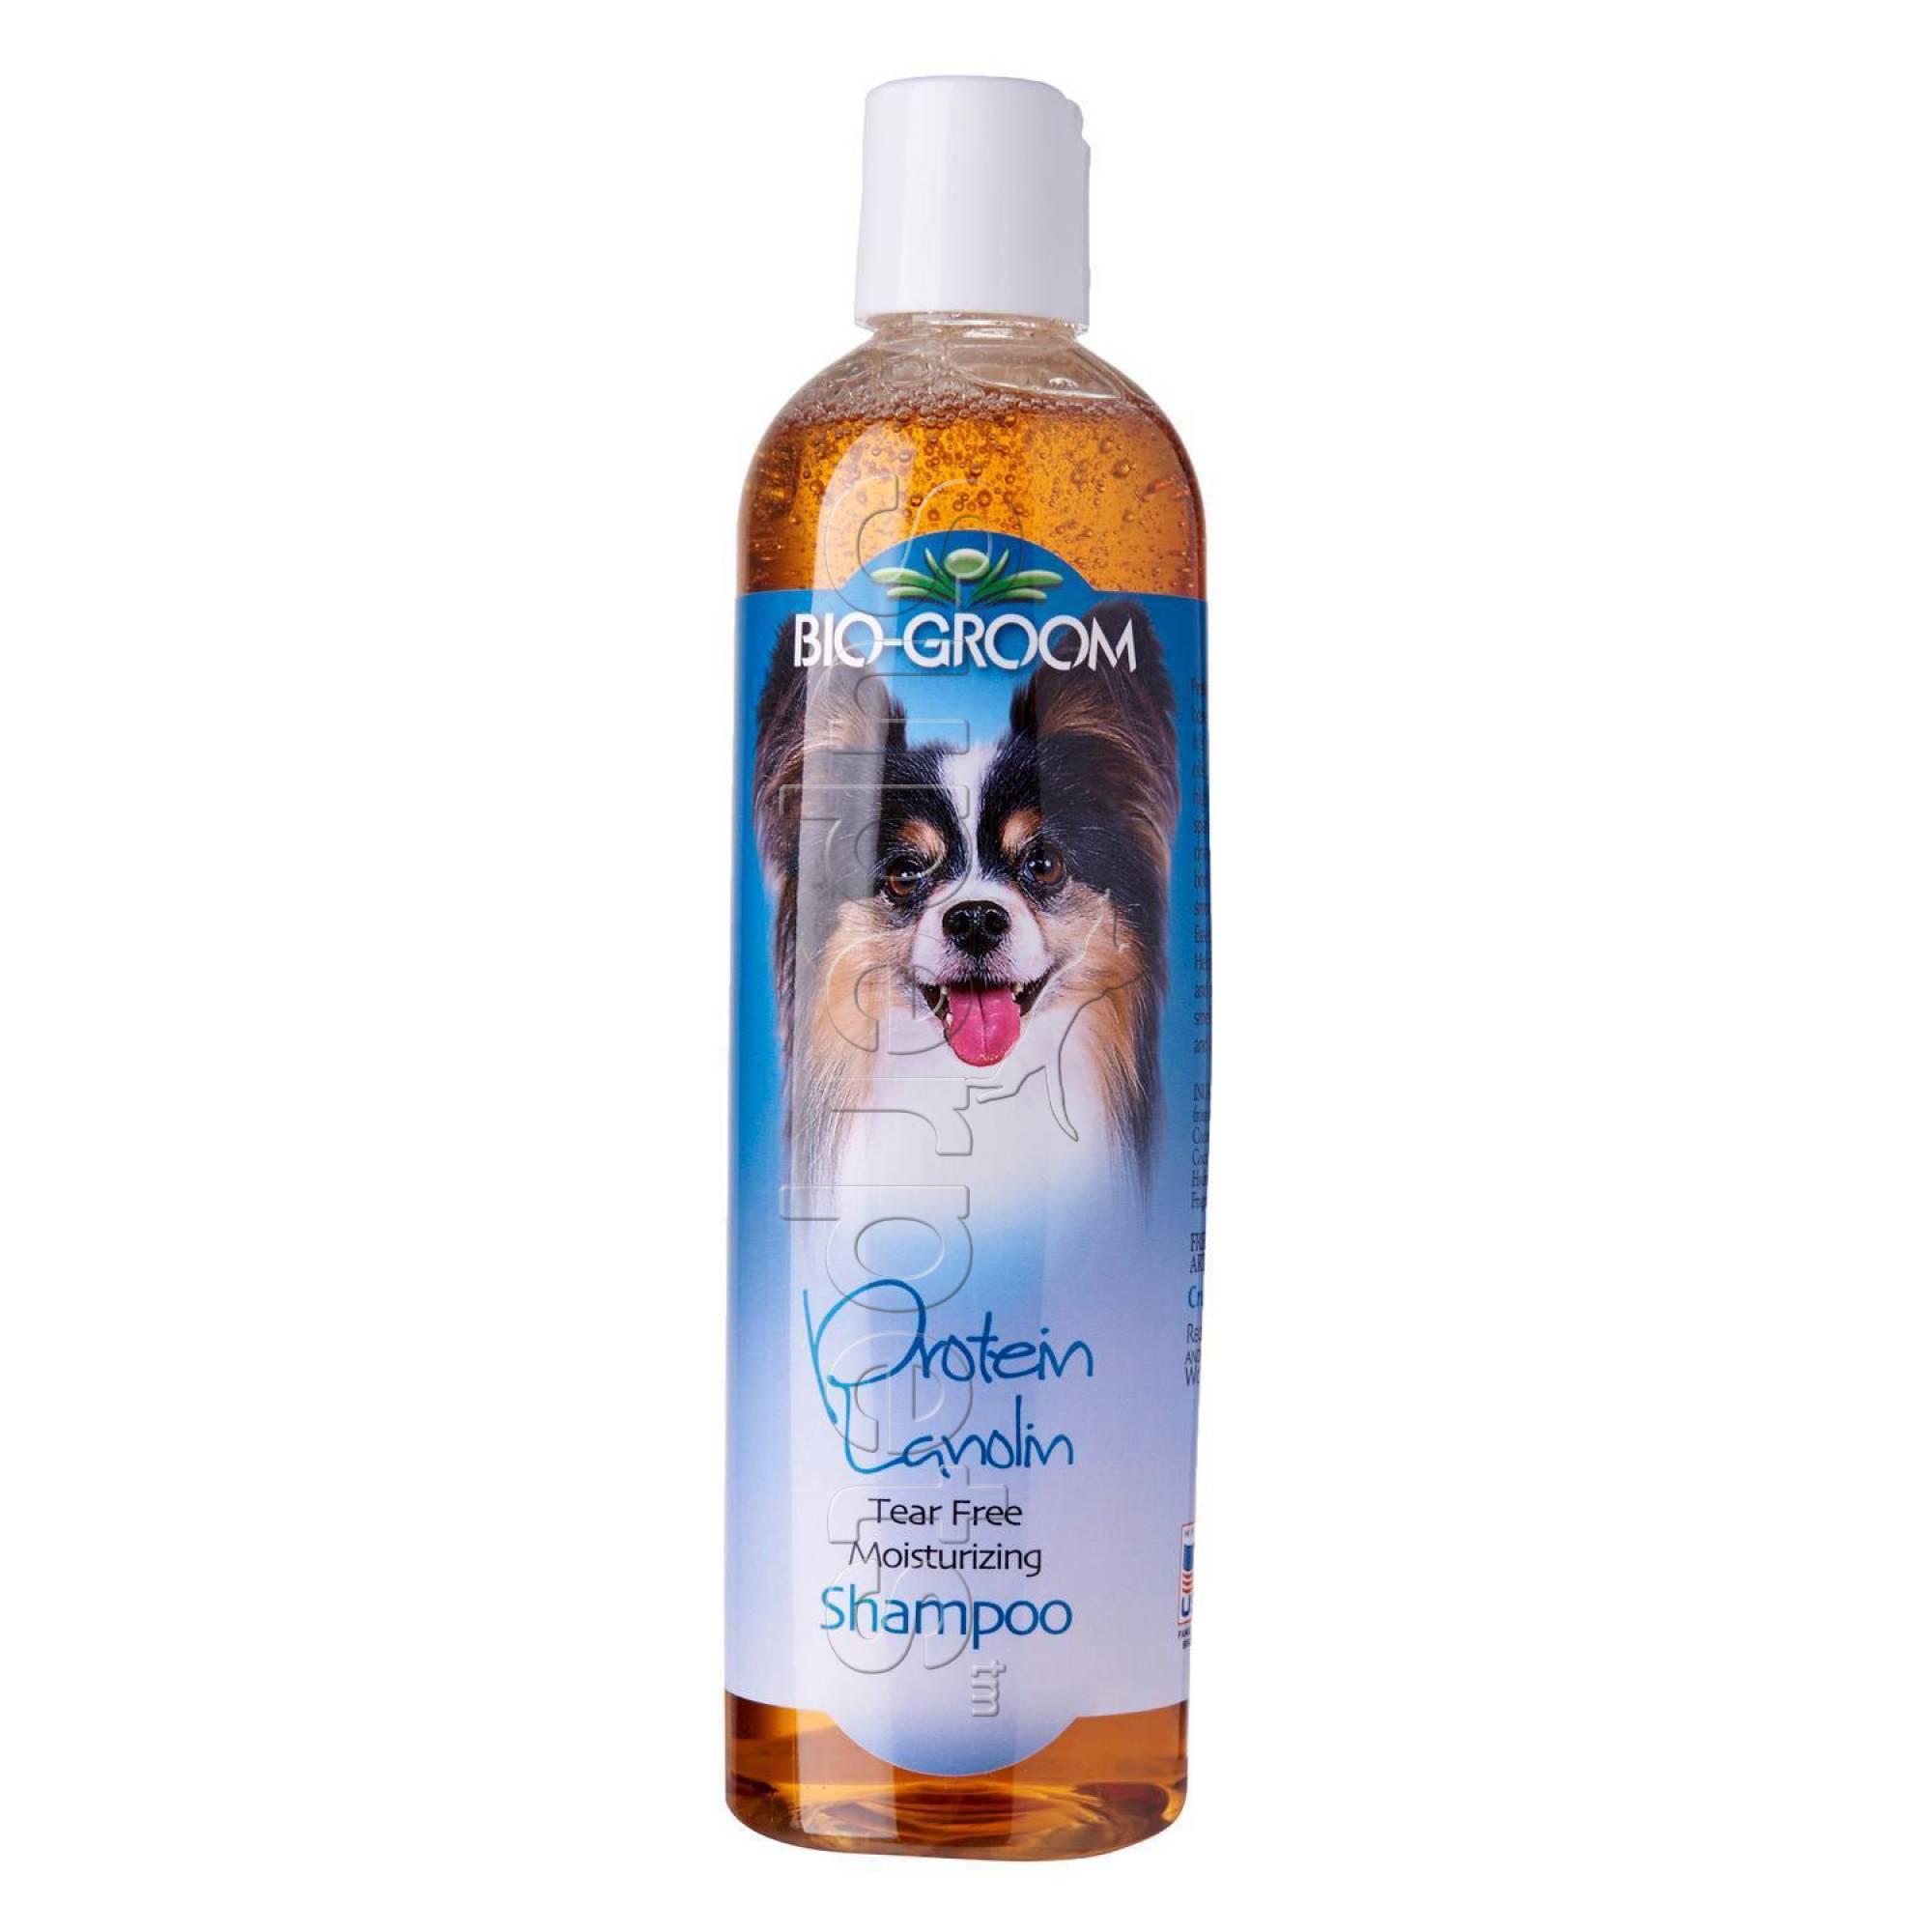 Bio-Groom Protein Lanolin Tear-Free Moisturizing Shampoo 12oz (355ml)